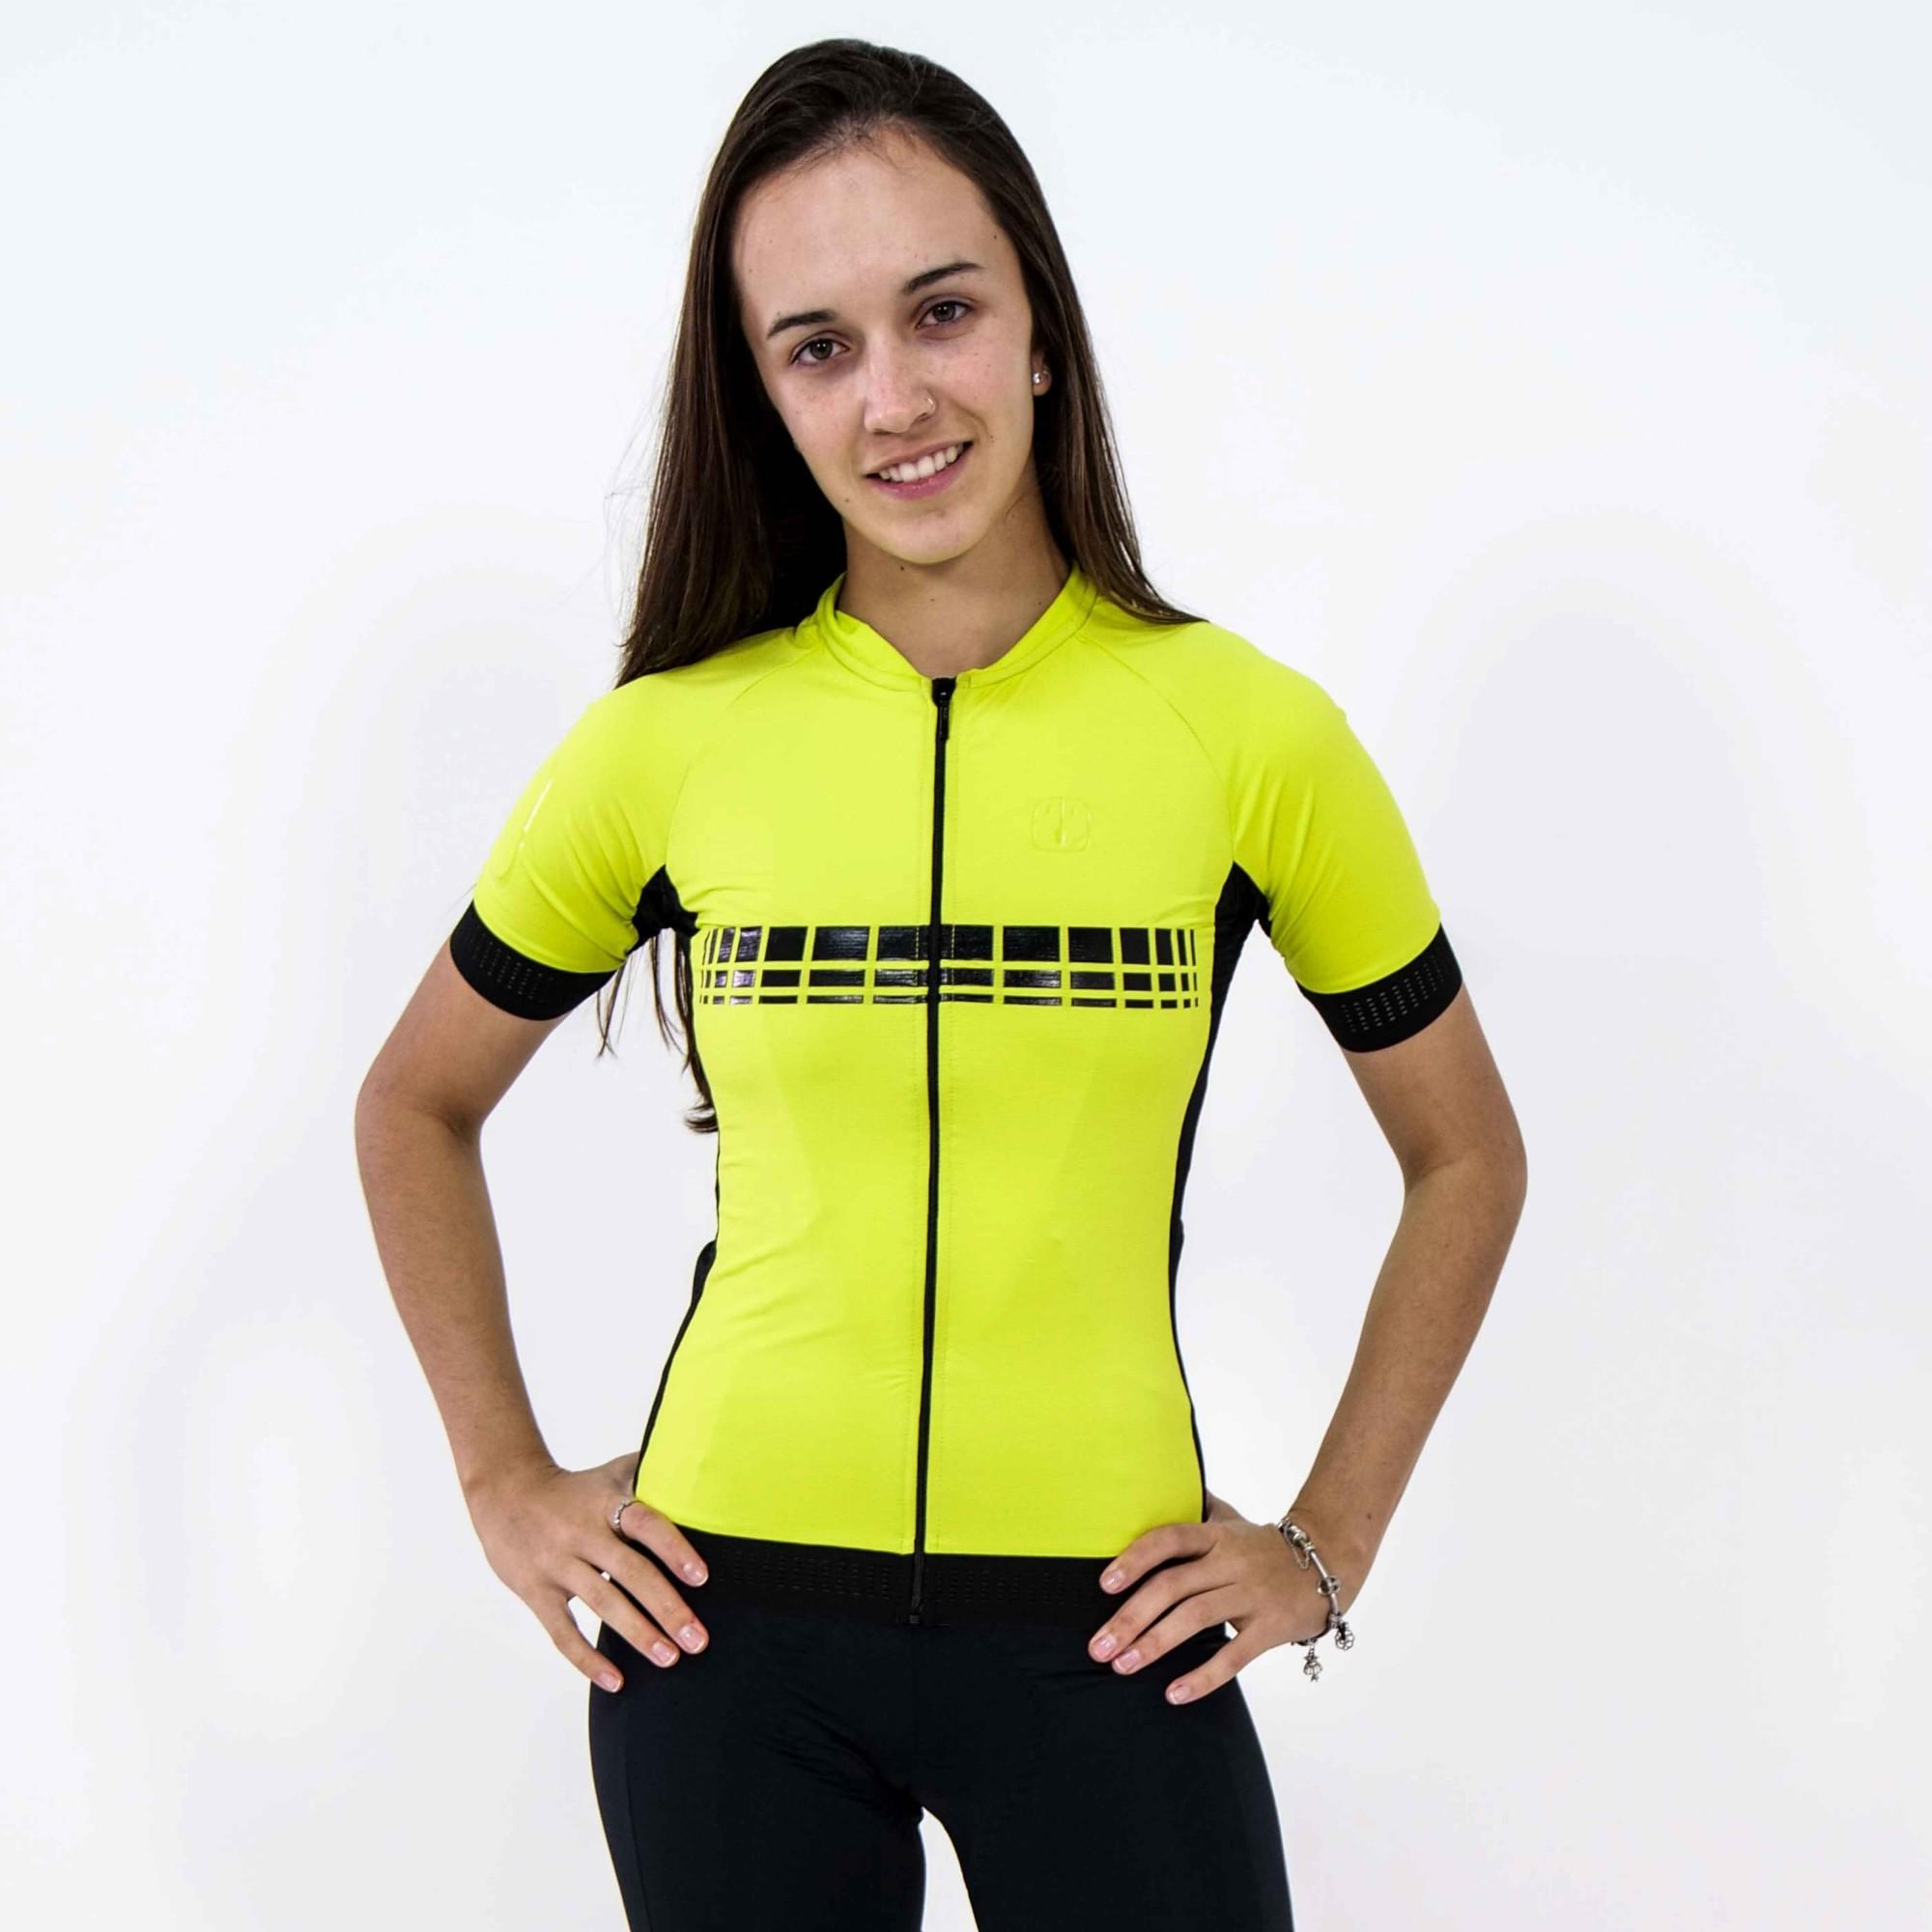 Camisa Ciclismo Racing Evo Lima - Feminina